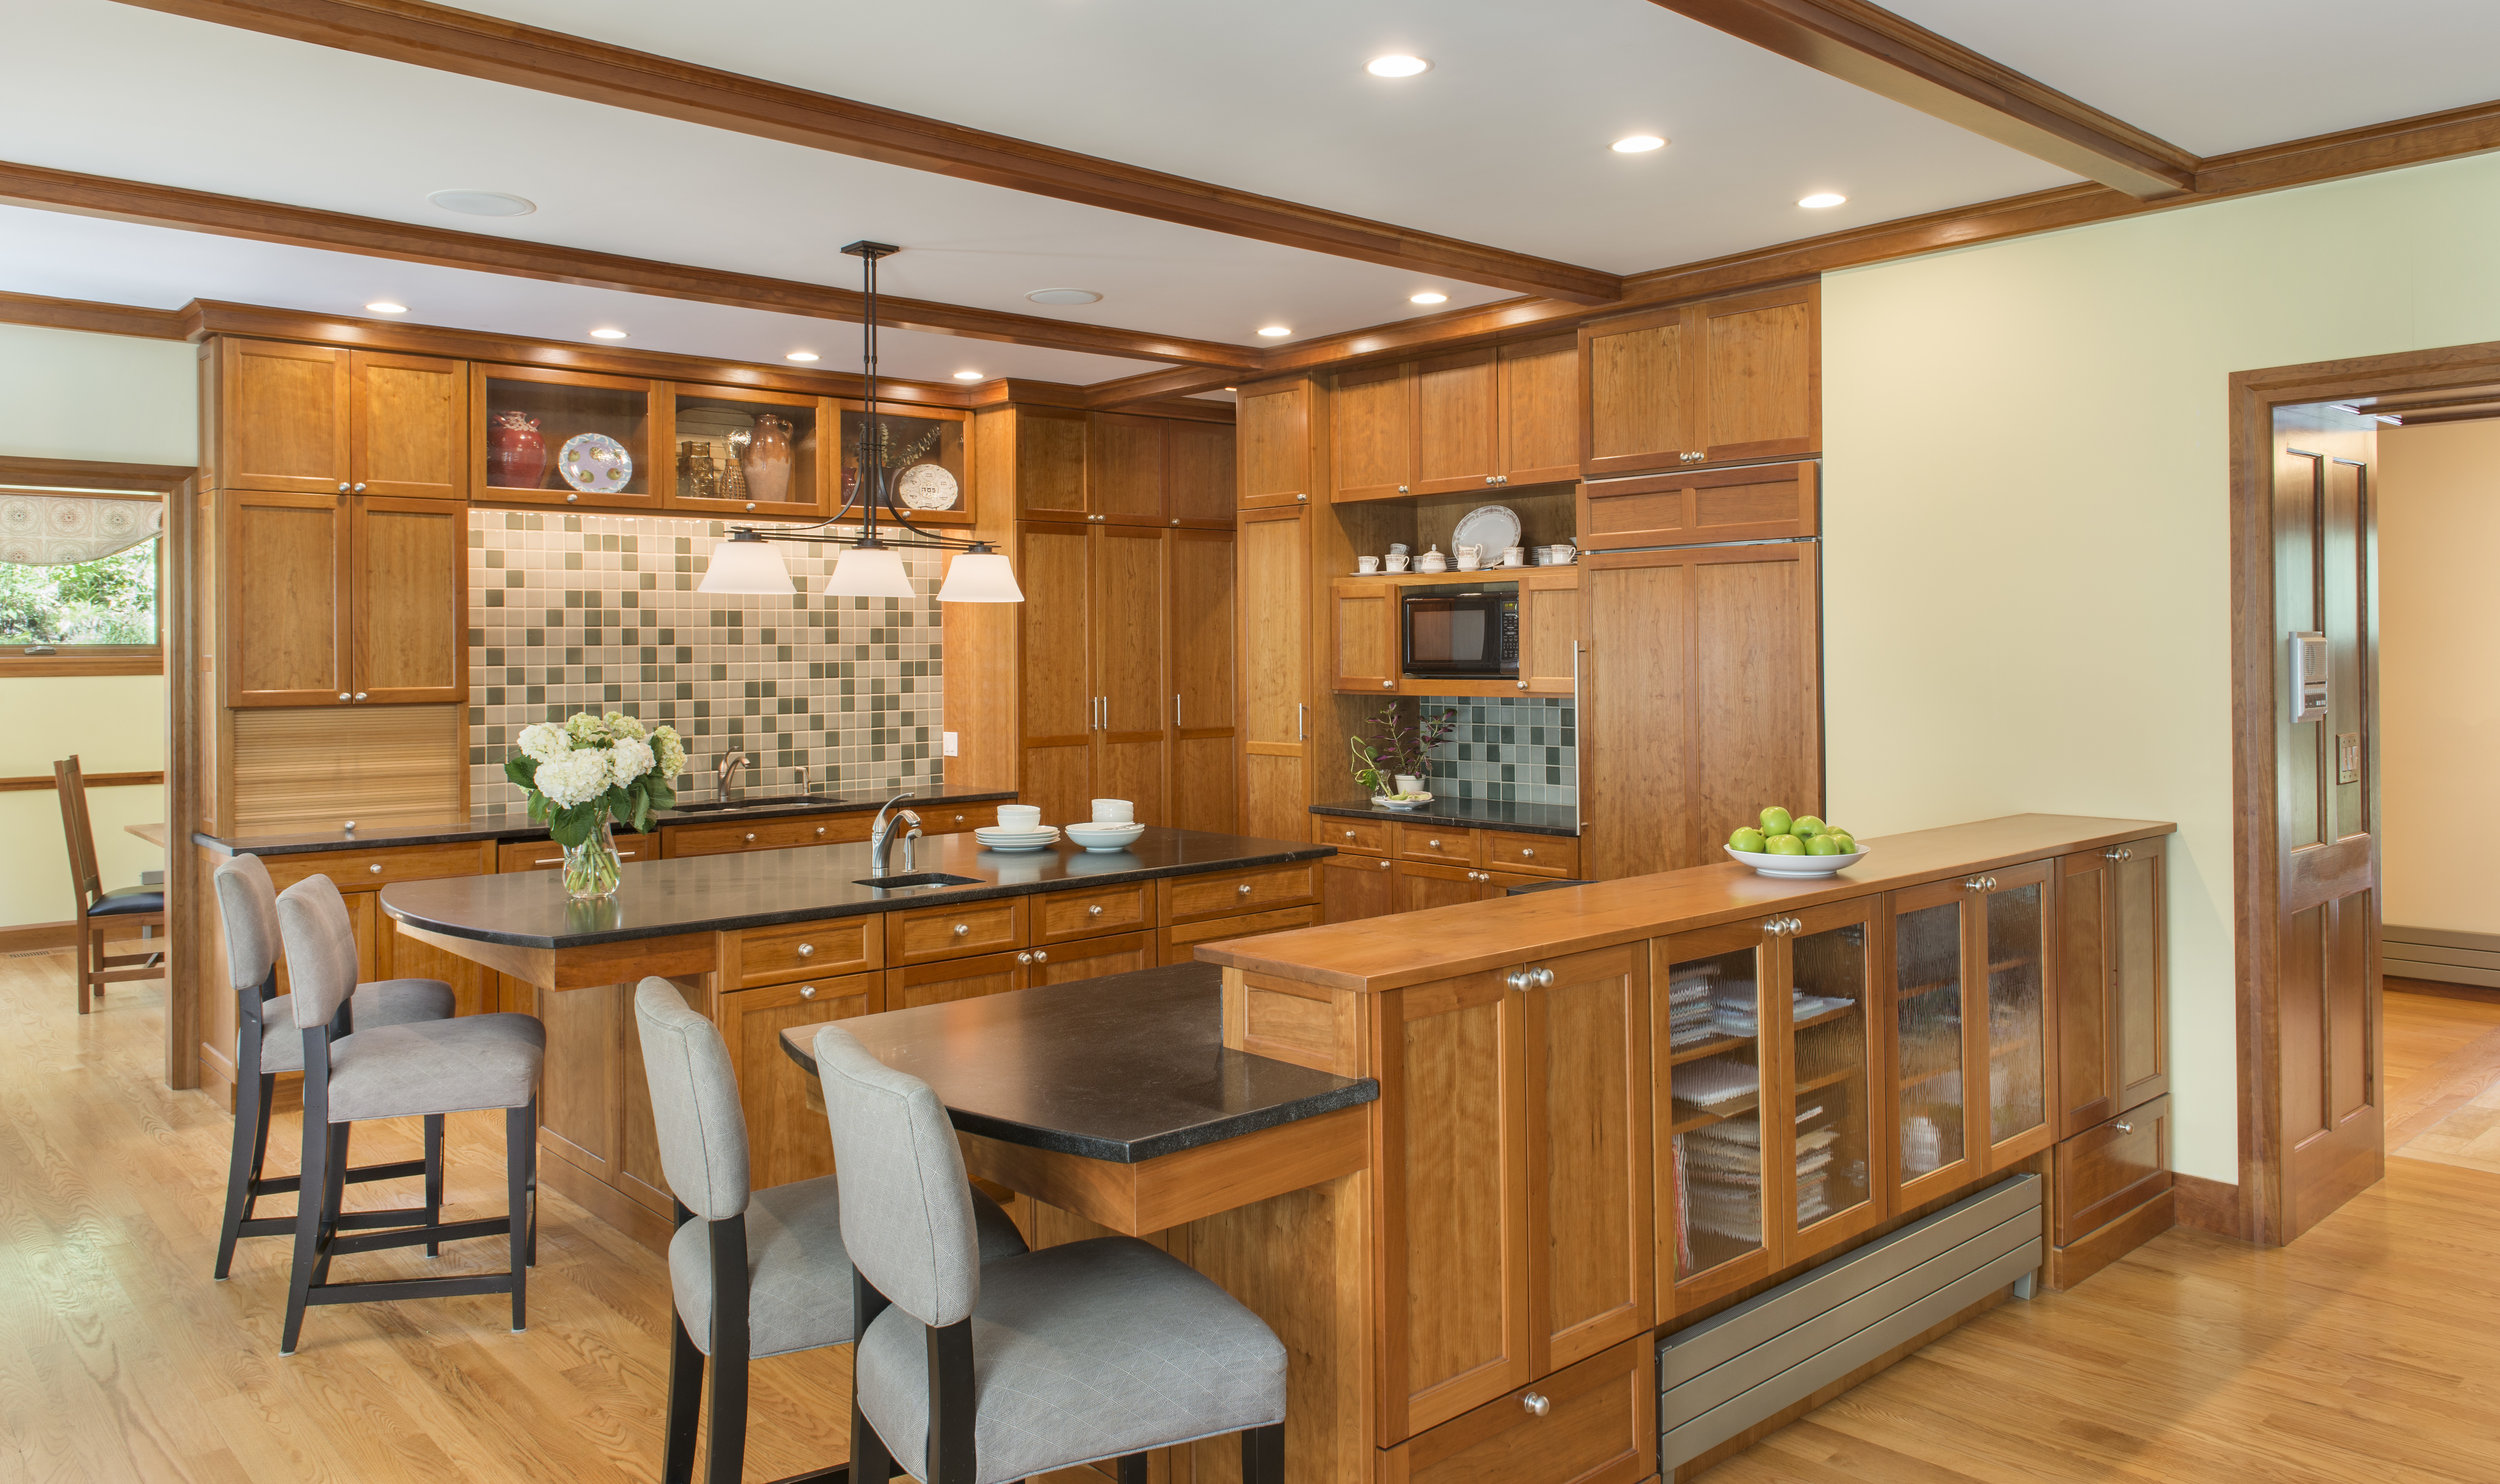 Custom kitchen with wood beams